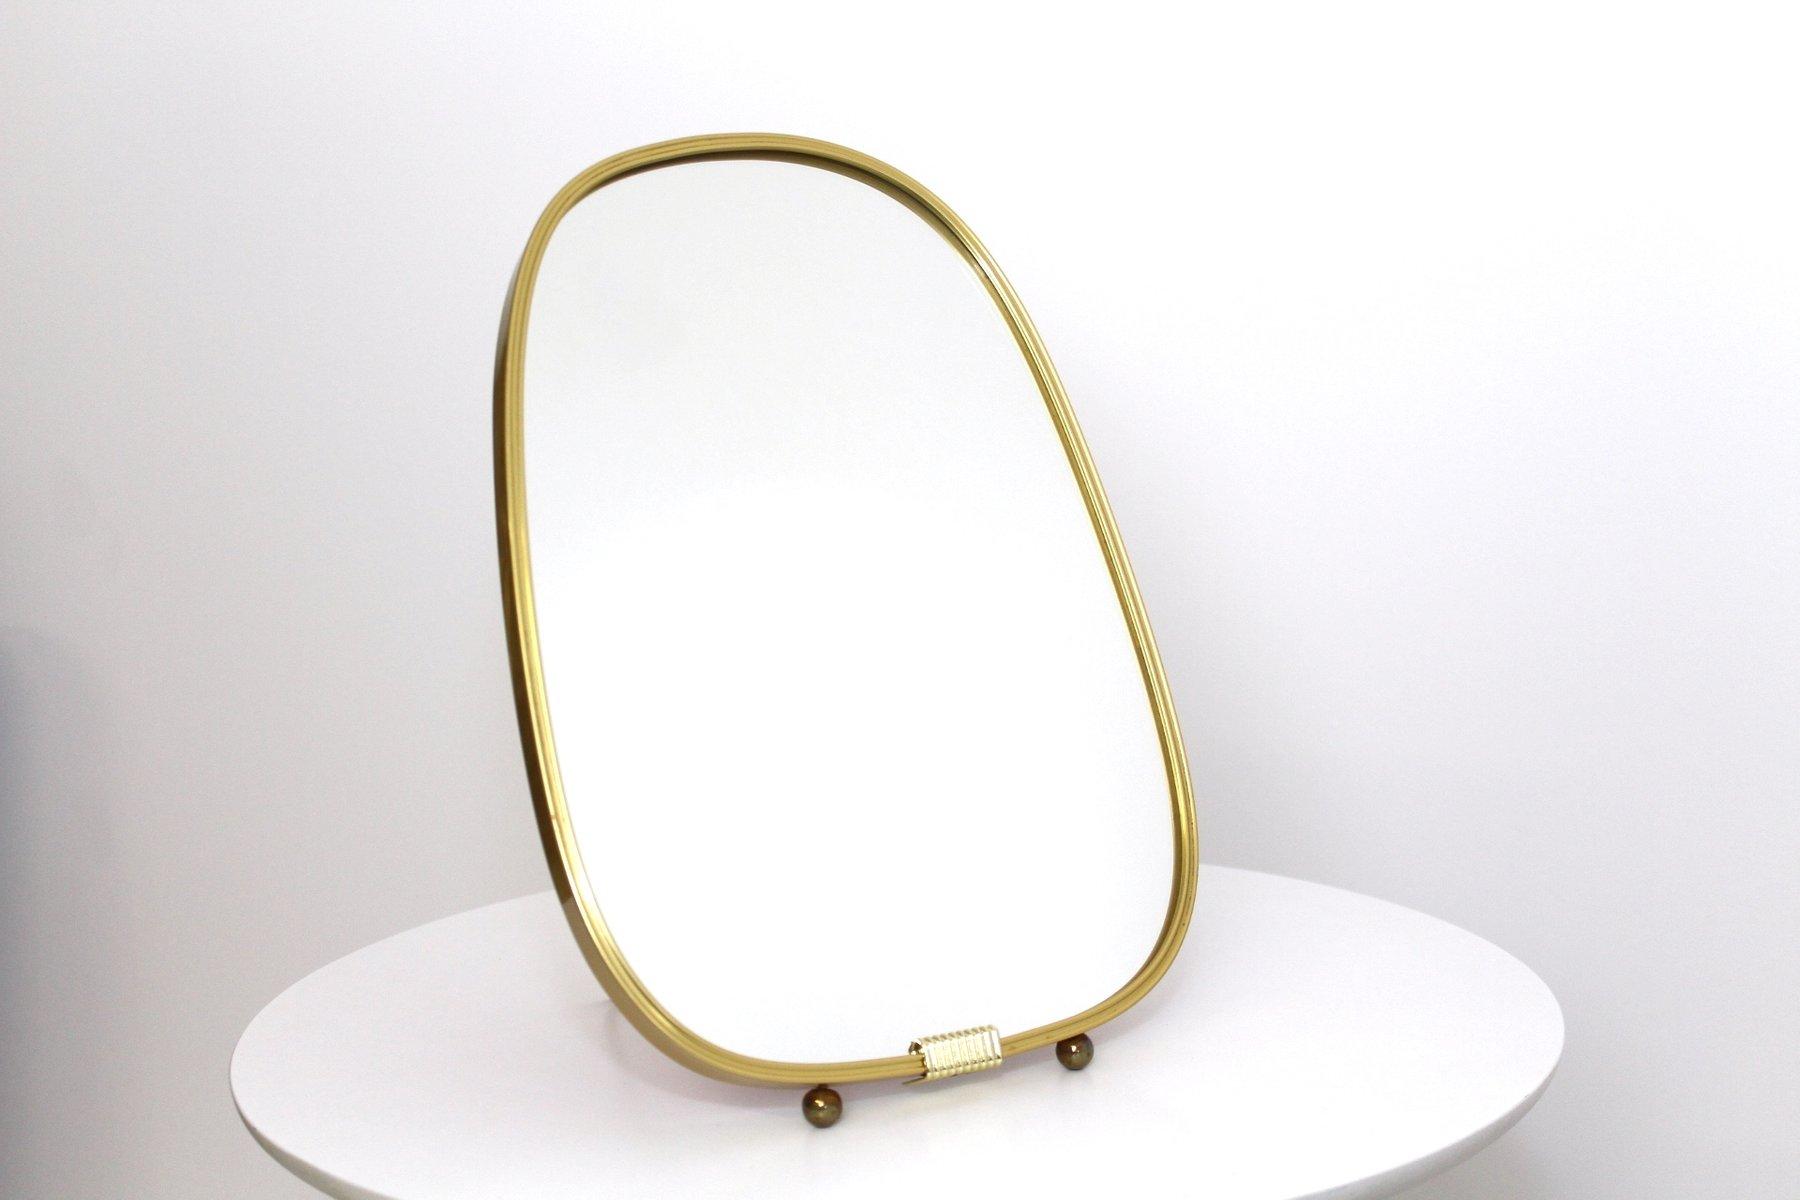 miroir poser de lachmayr 1950s en vente sur pamono. Black Bedroom Furniture Sets. Home Design Ideas